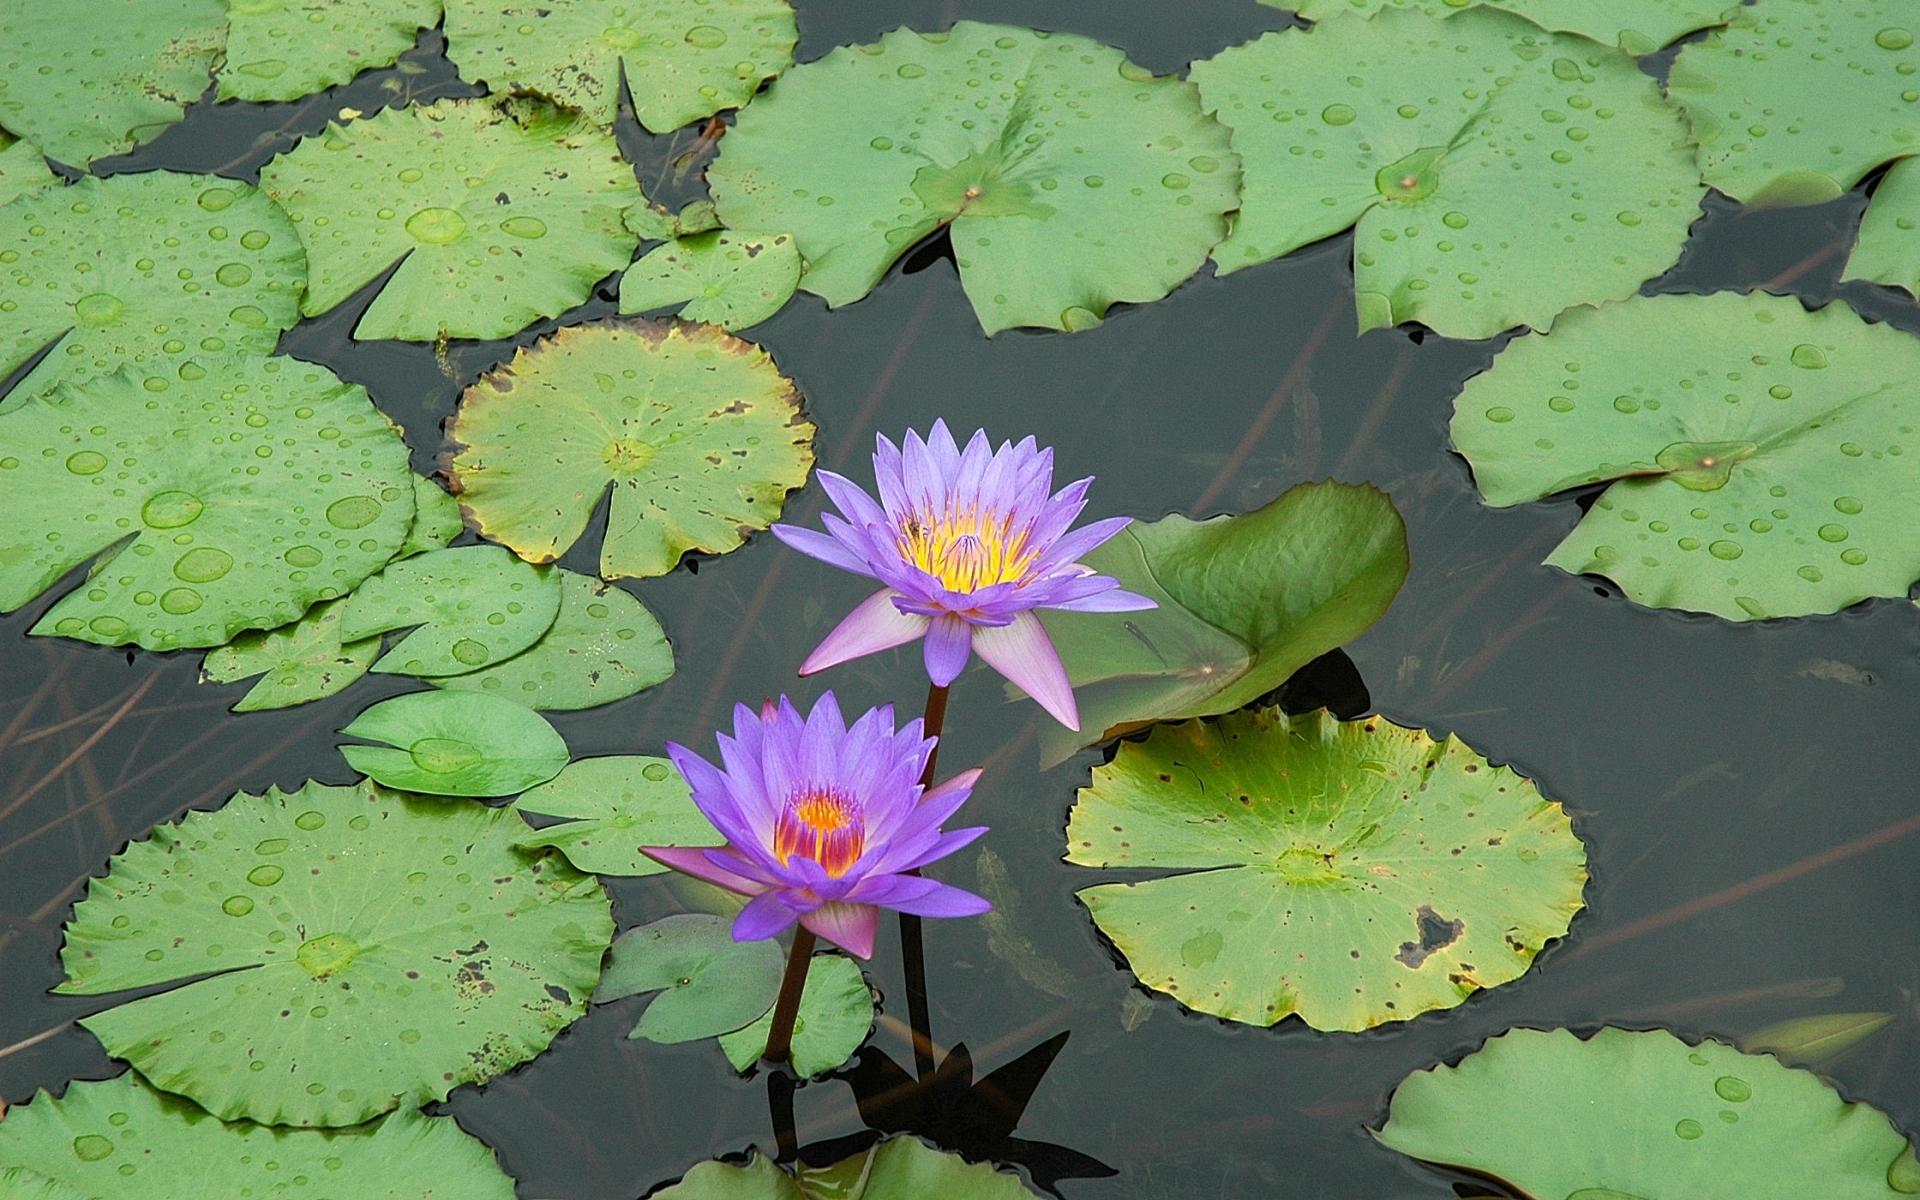 Fondos de pantalla hojas agua verde estanque pantano for Agua verde estanque